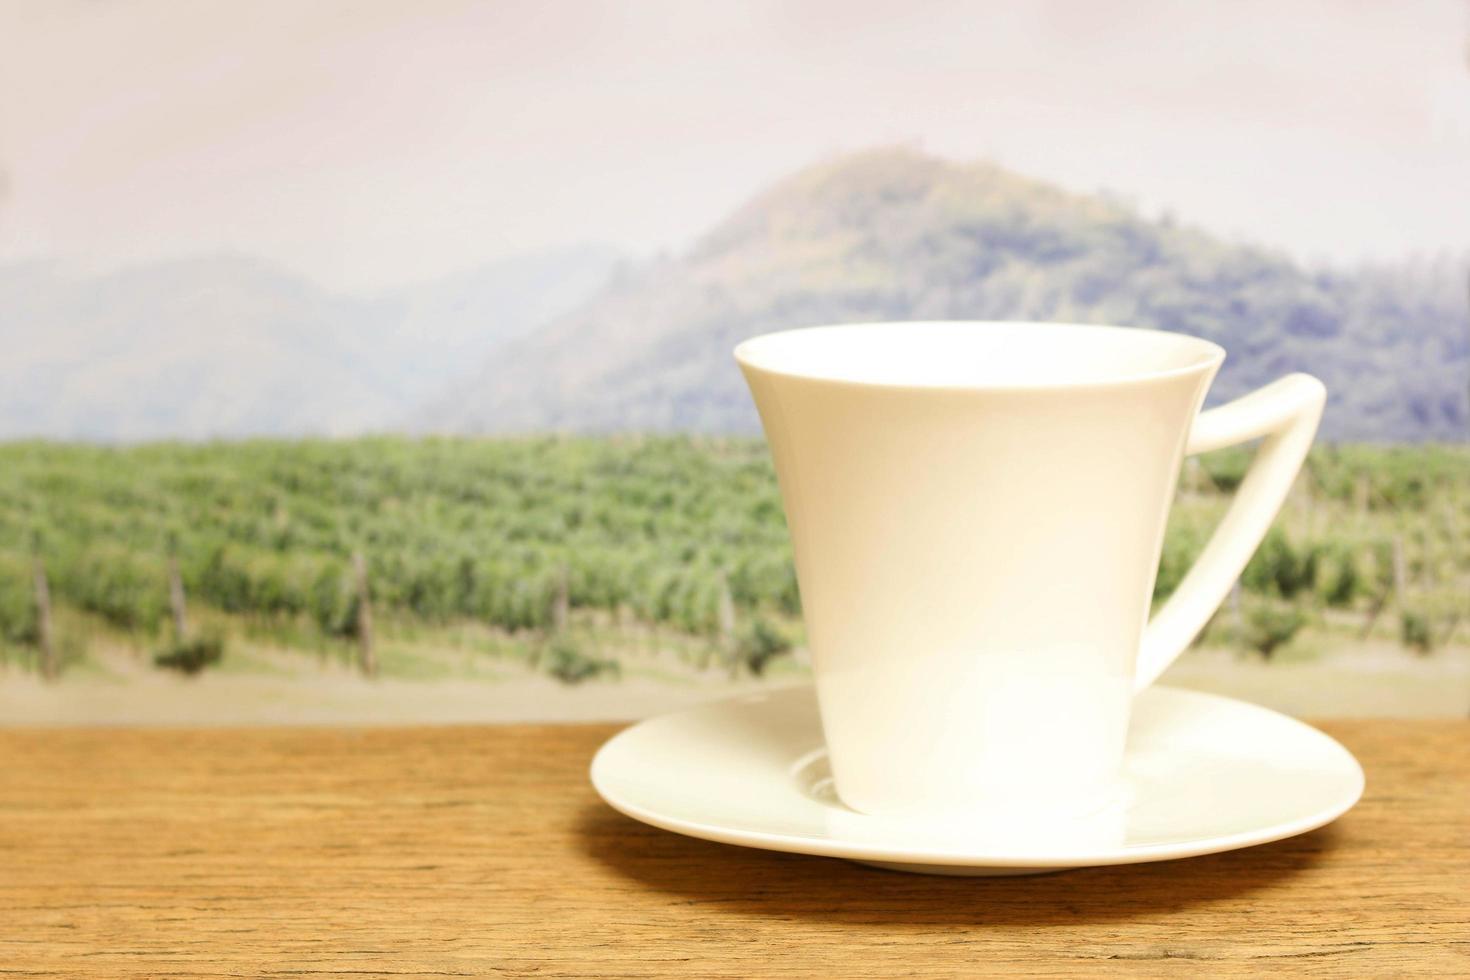 tasse blanche devant un champ photo